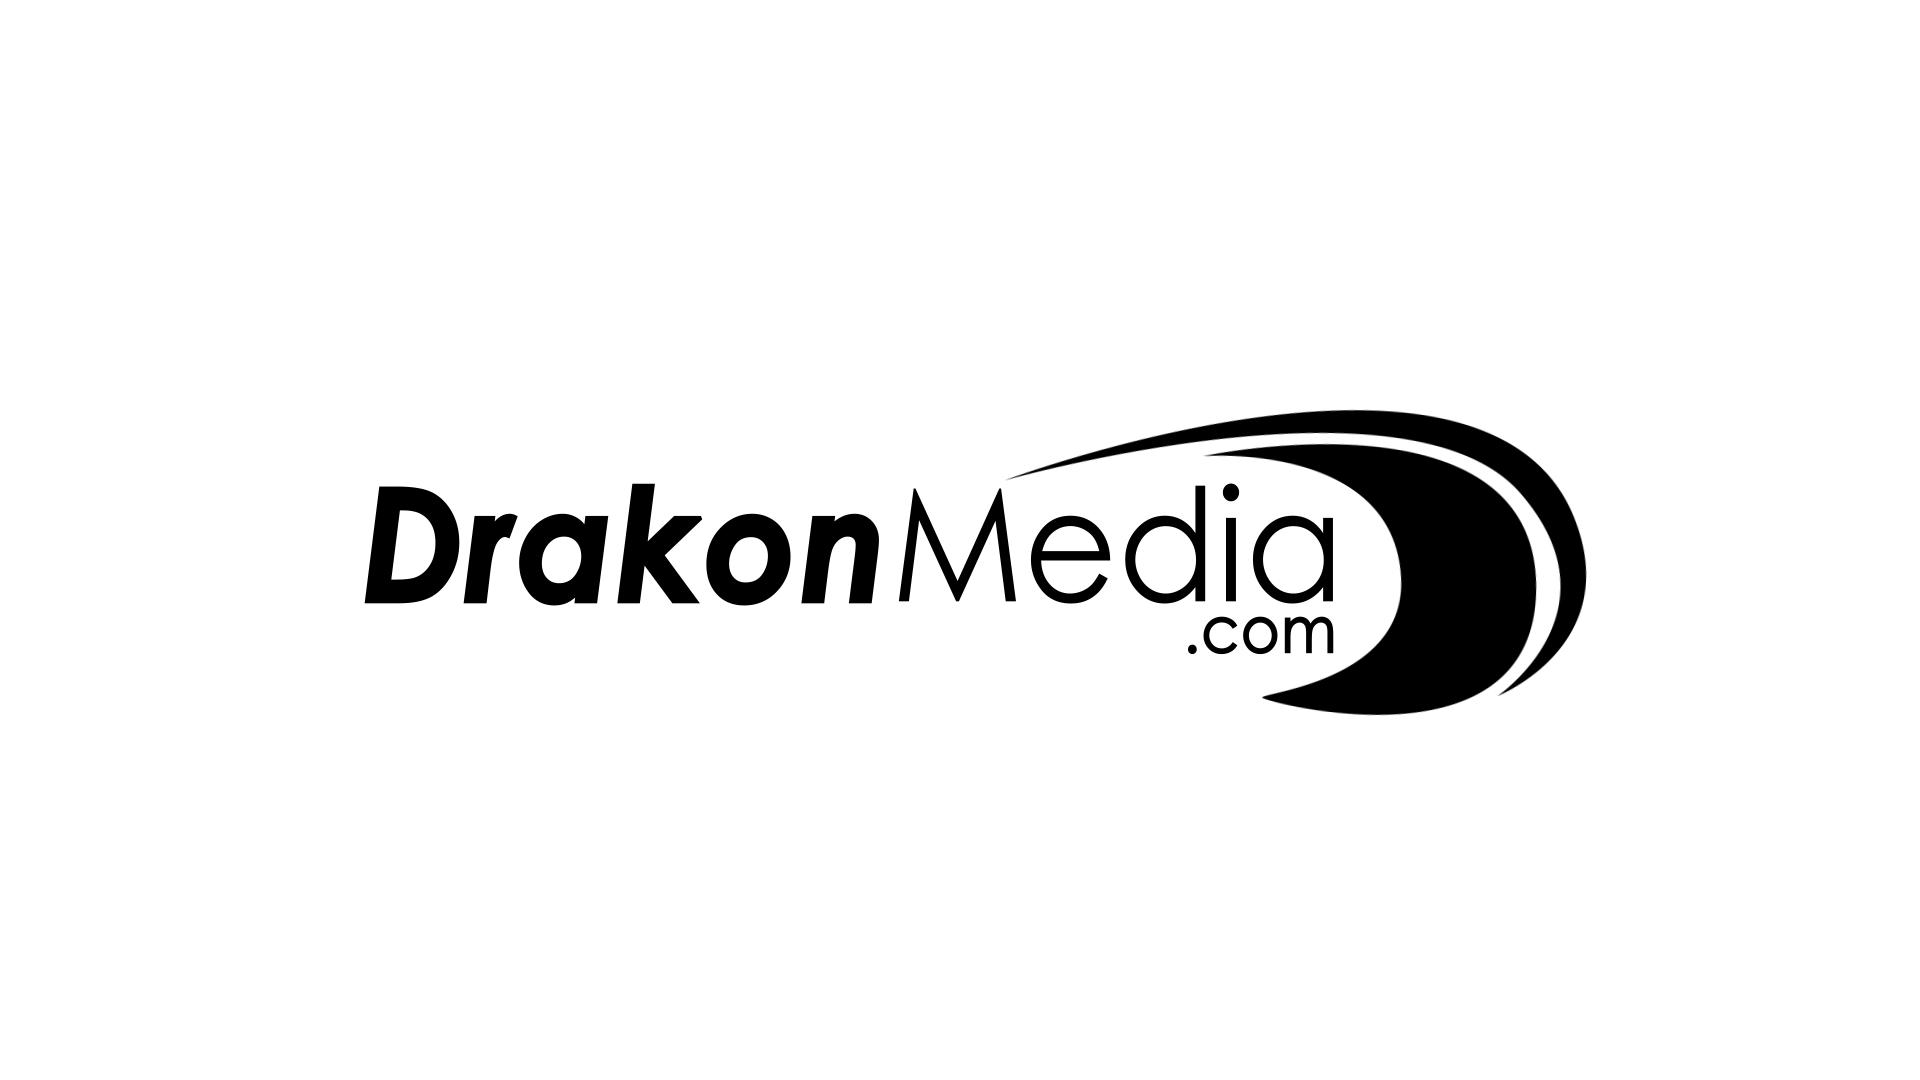 DrakonMediaLogo